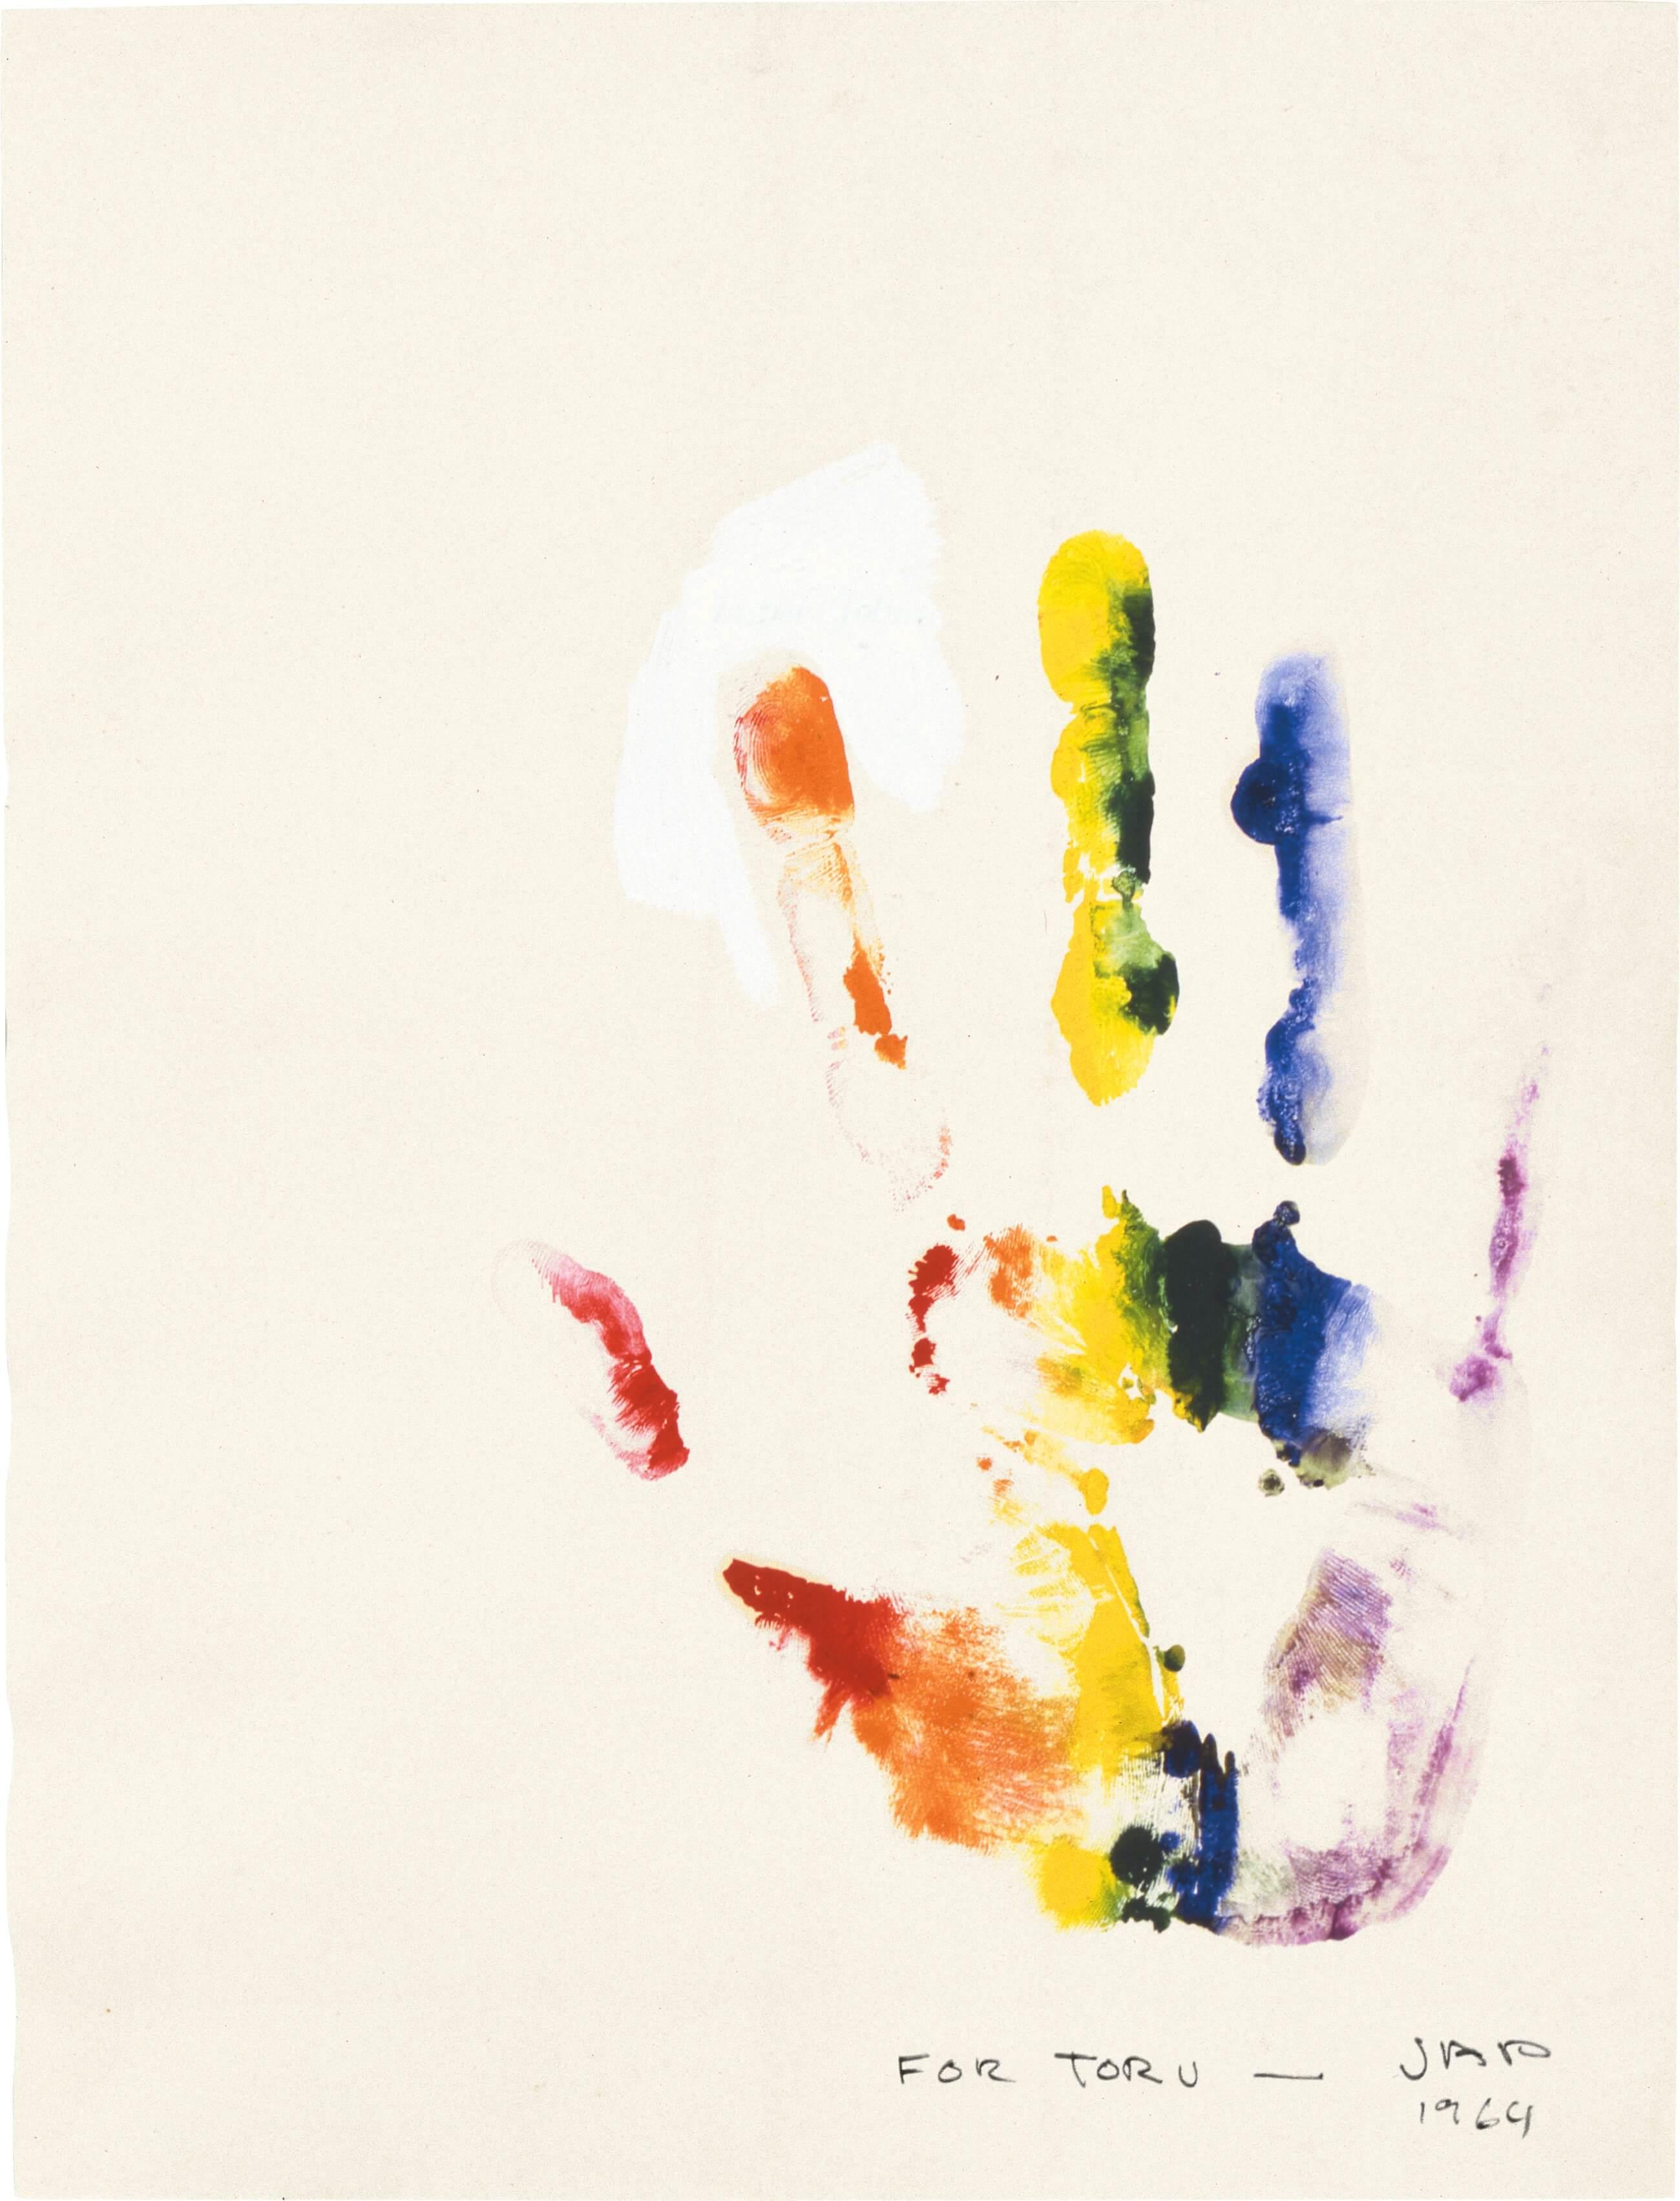 For Toru, 1964, by Jasper Johns